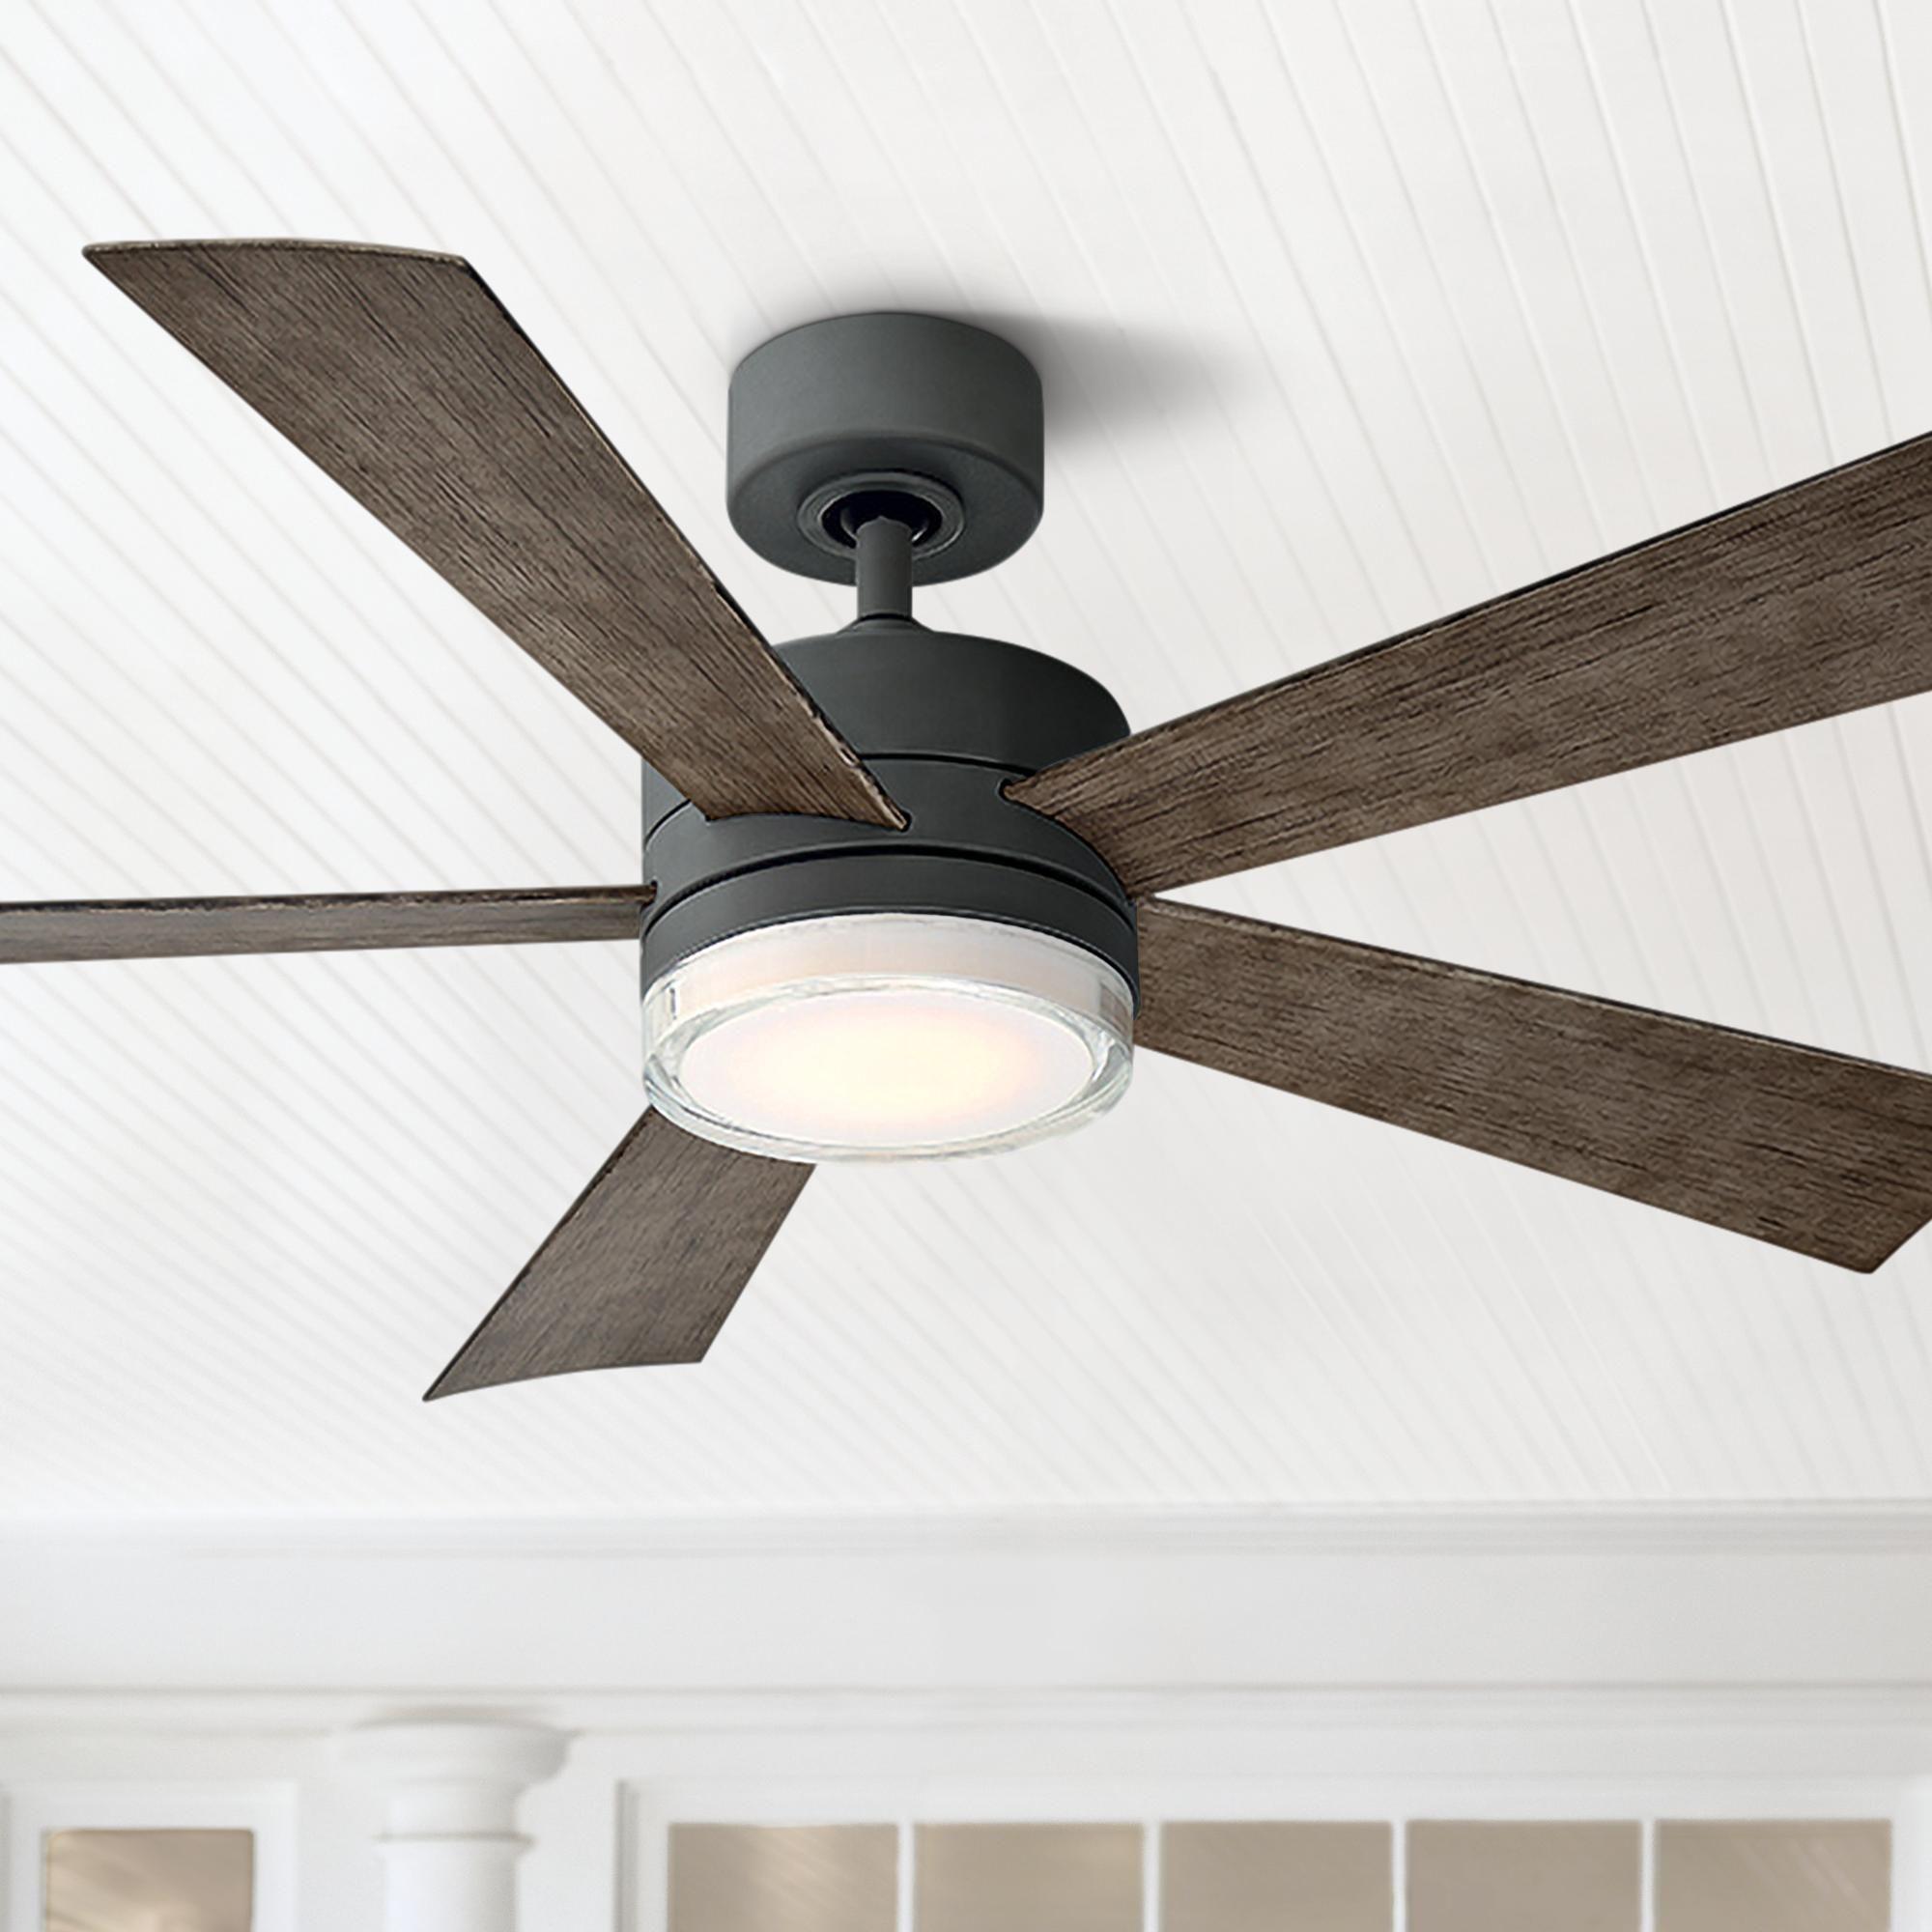 52 Inch Modern Forms Wynd Graphite Led Wet Ceiling Fan | brandowstore.com